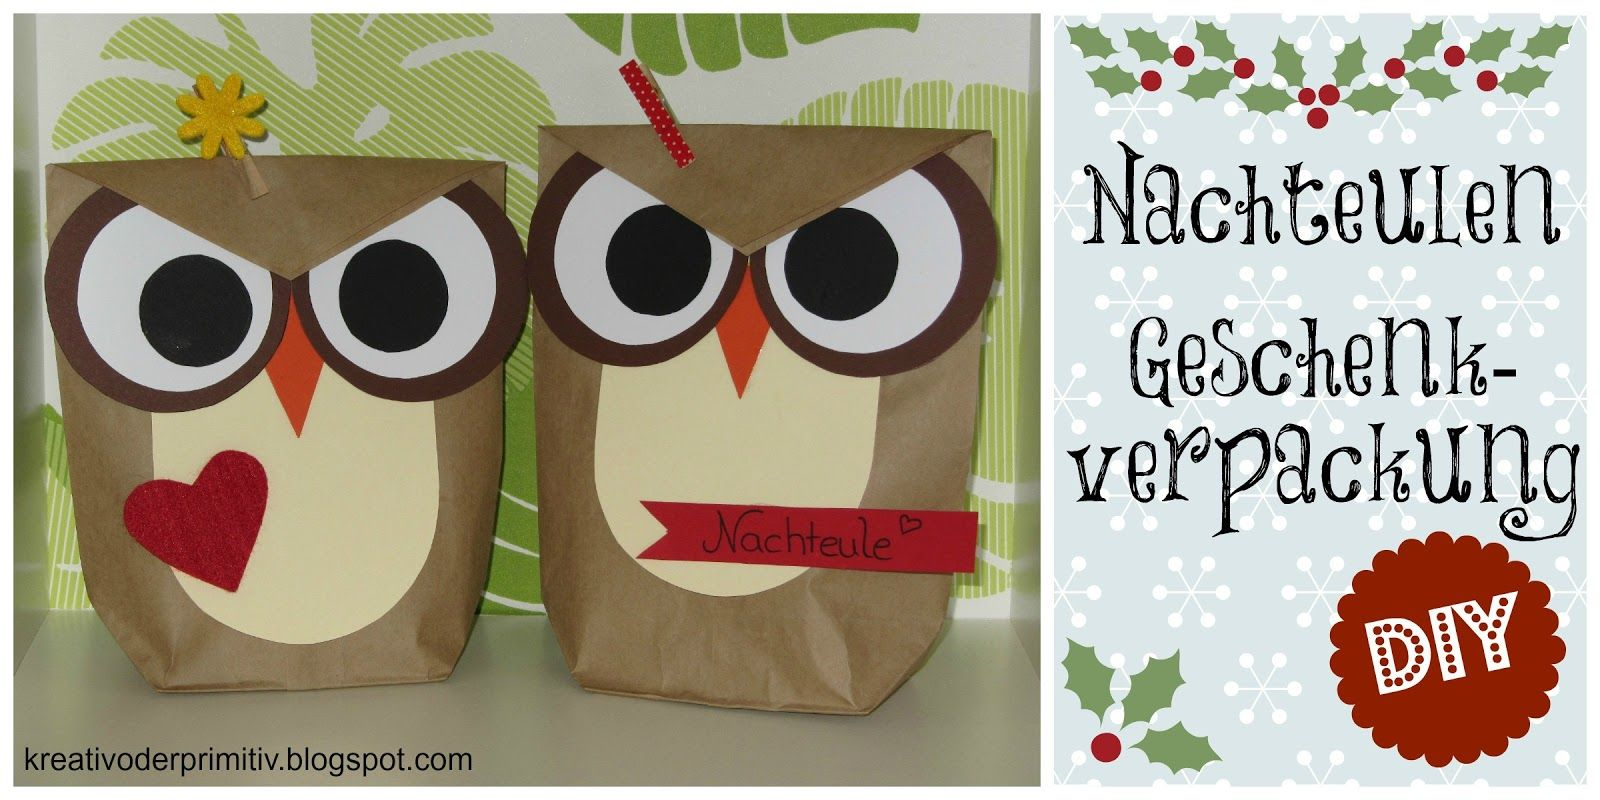 Eule Nachteule Geschenk Verpackung Idee Diy Selber Machen Basteln Anleitung  Tutorial Basteln Weihnachten Geburtstag T�te Karton